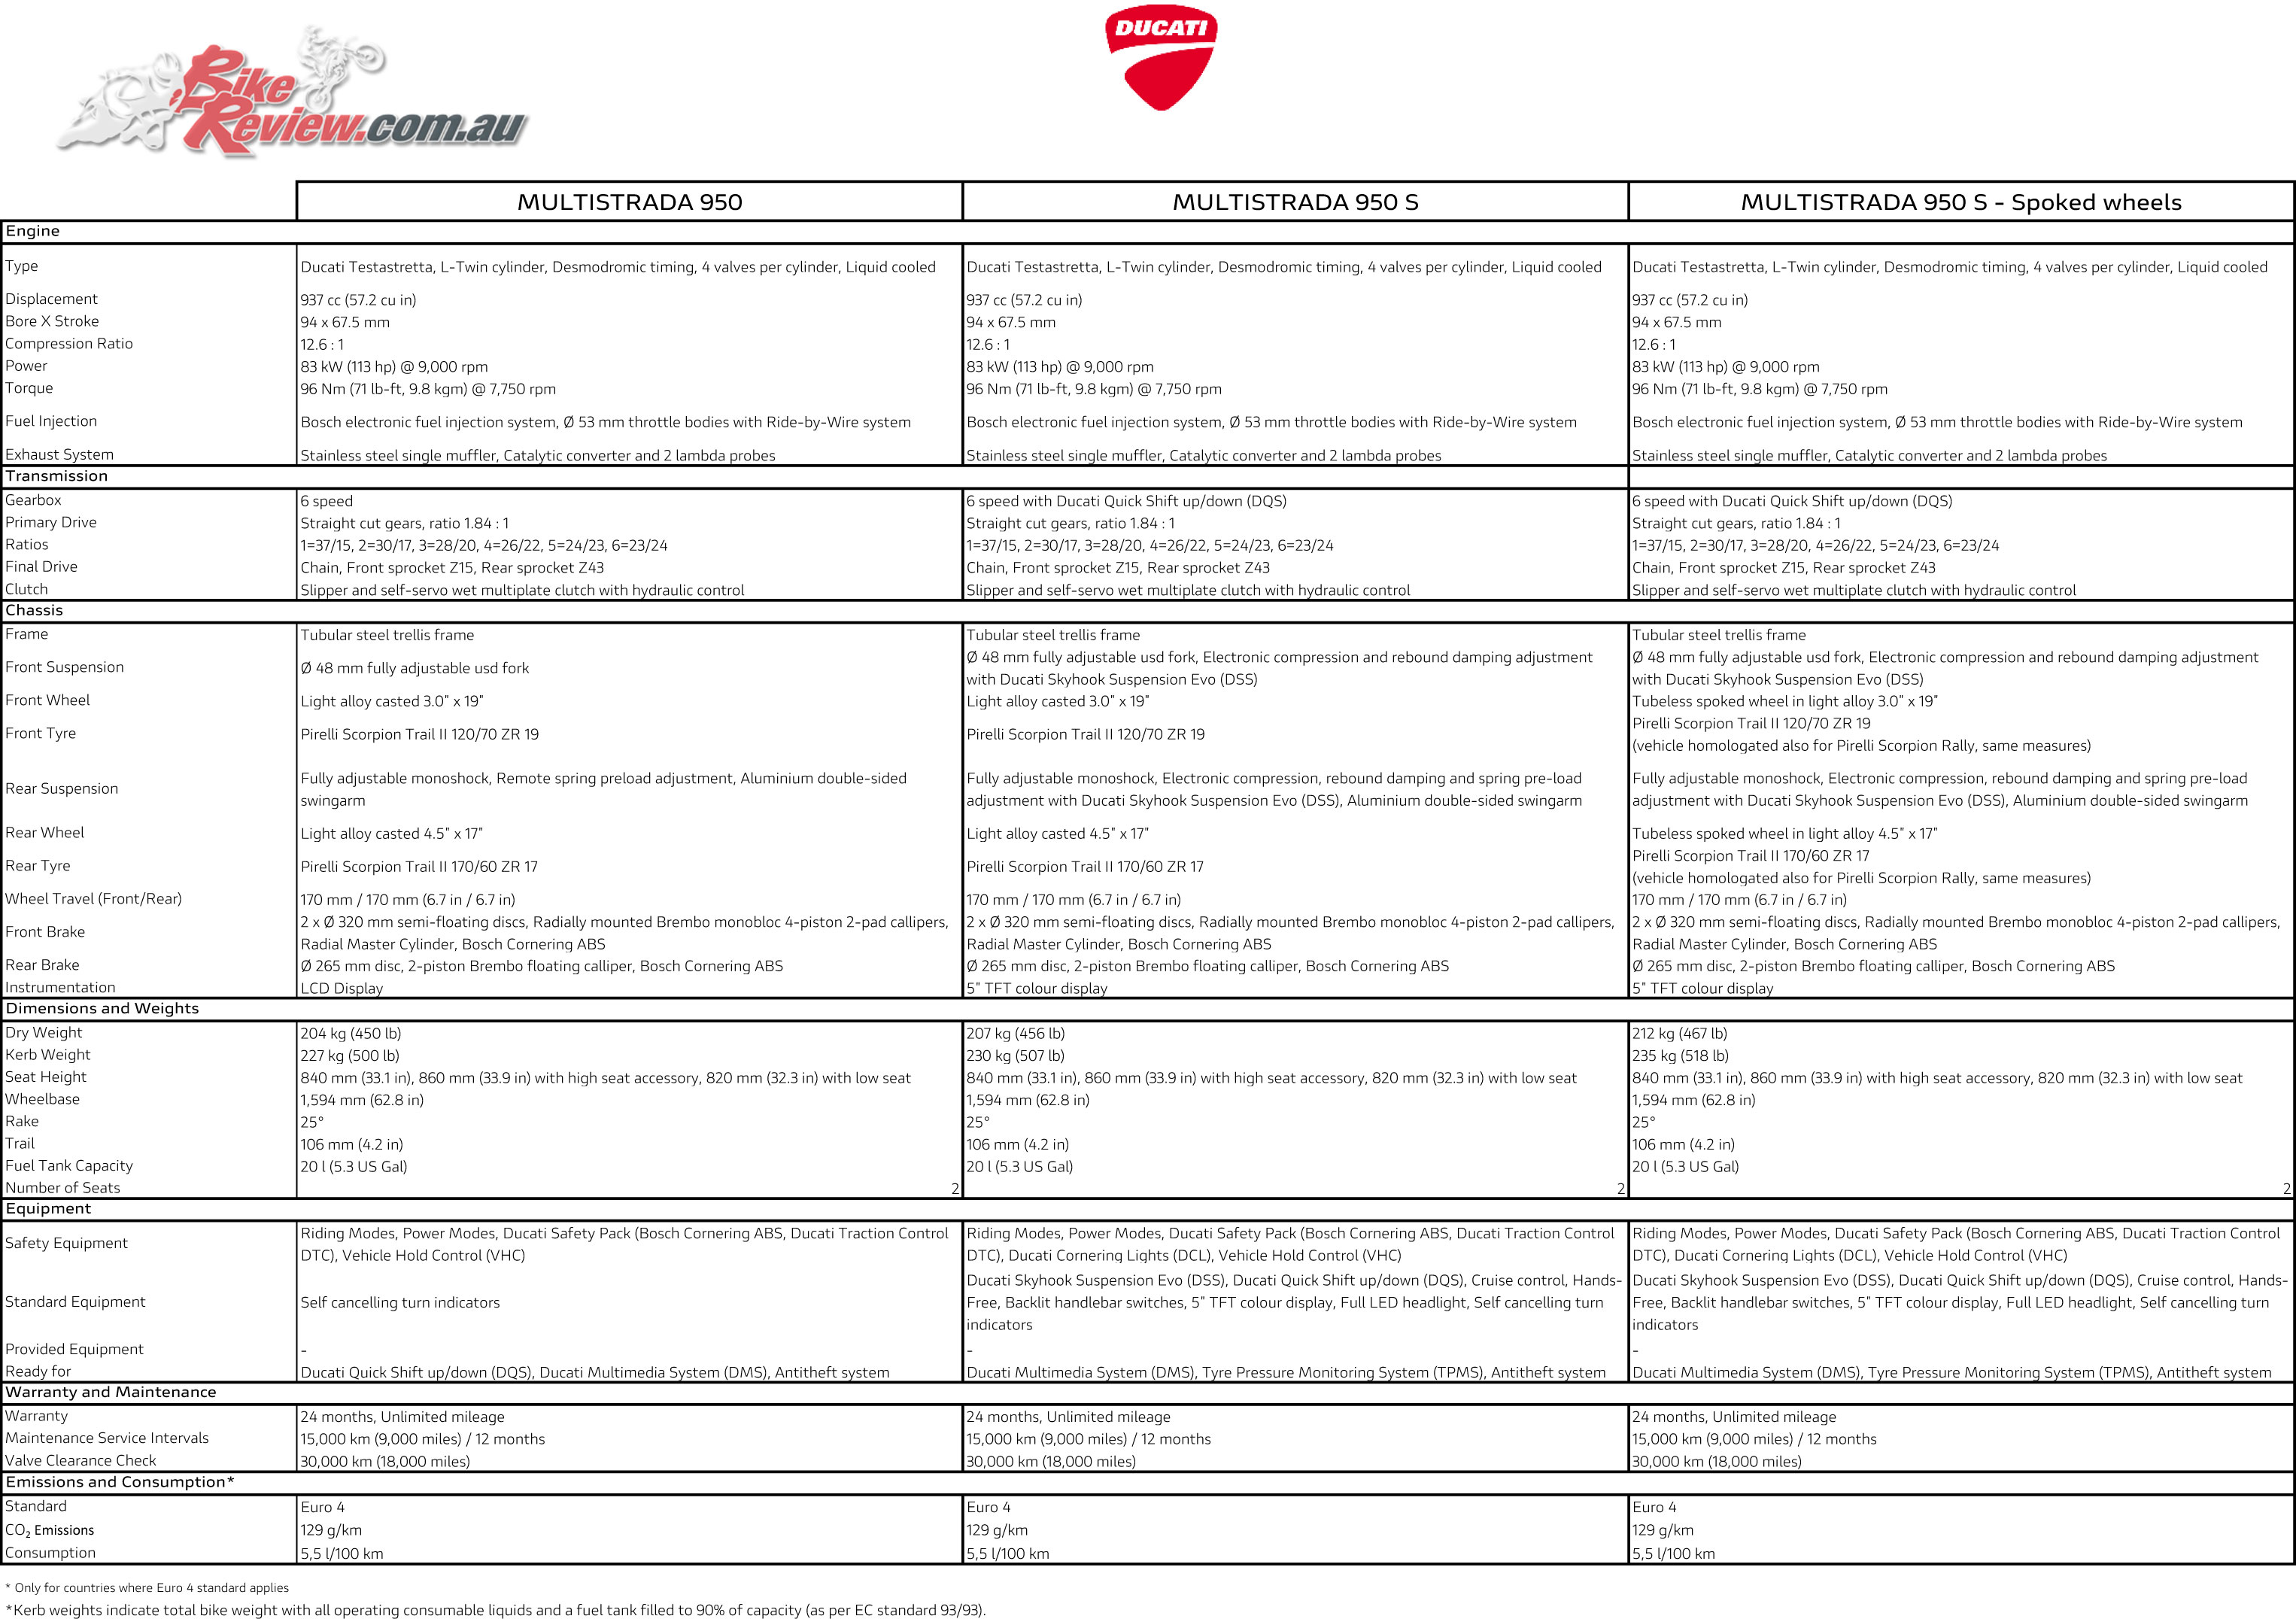 2019 Ducati Multistrada 950 Specifications